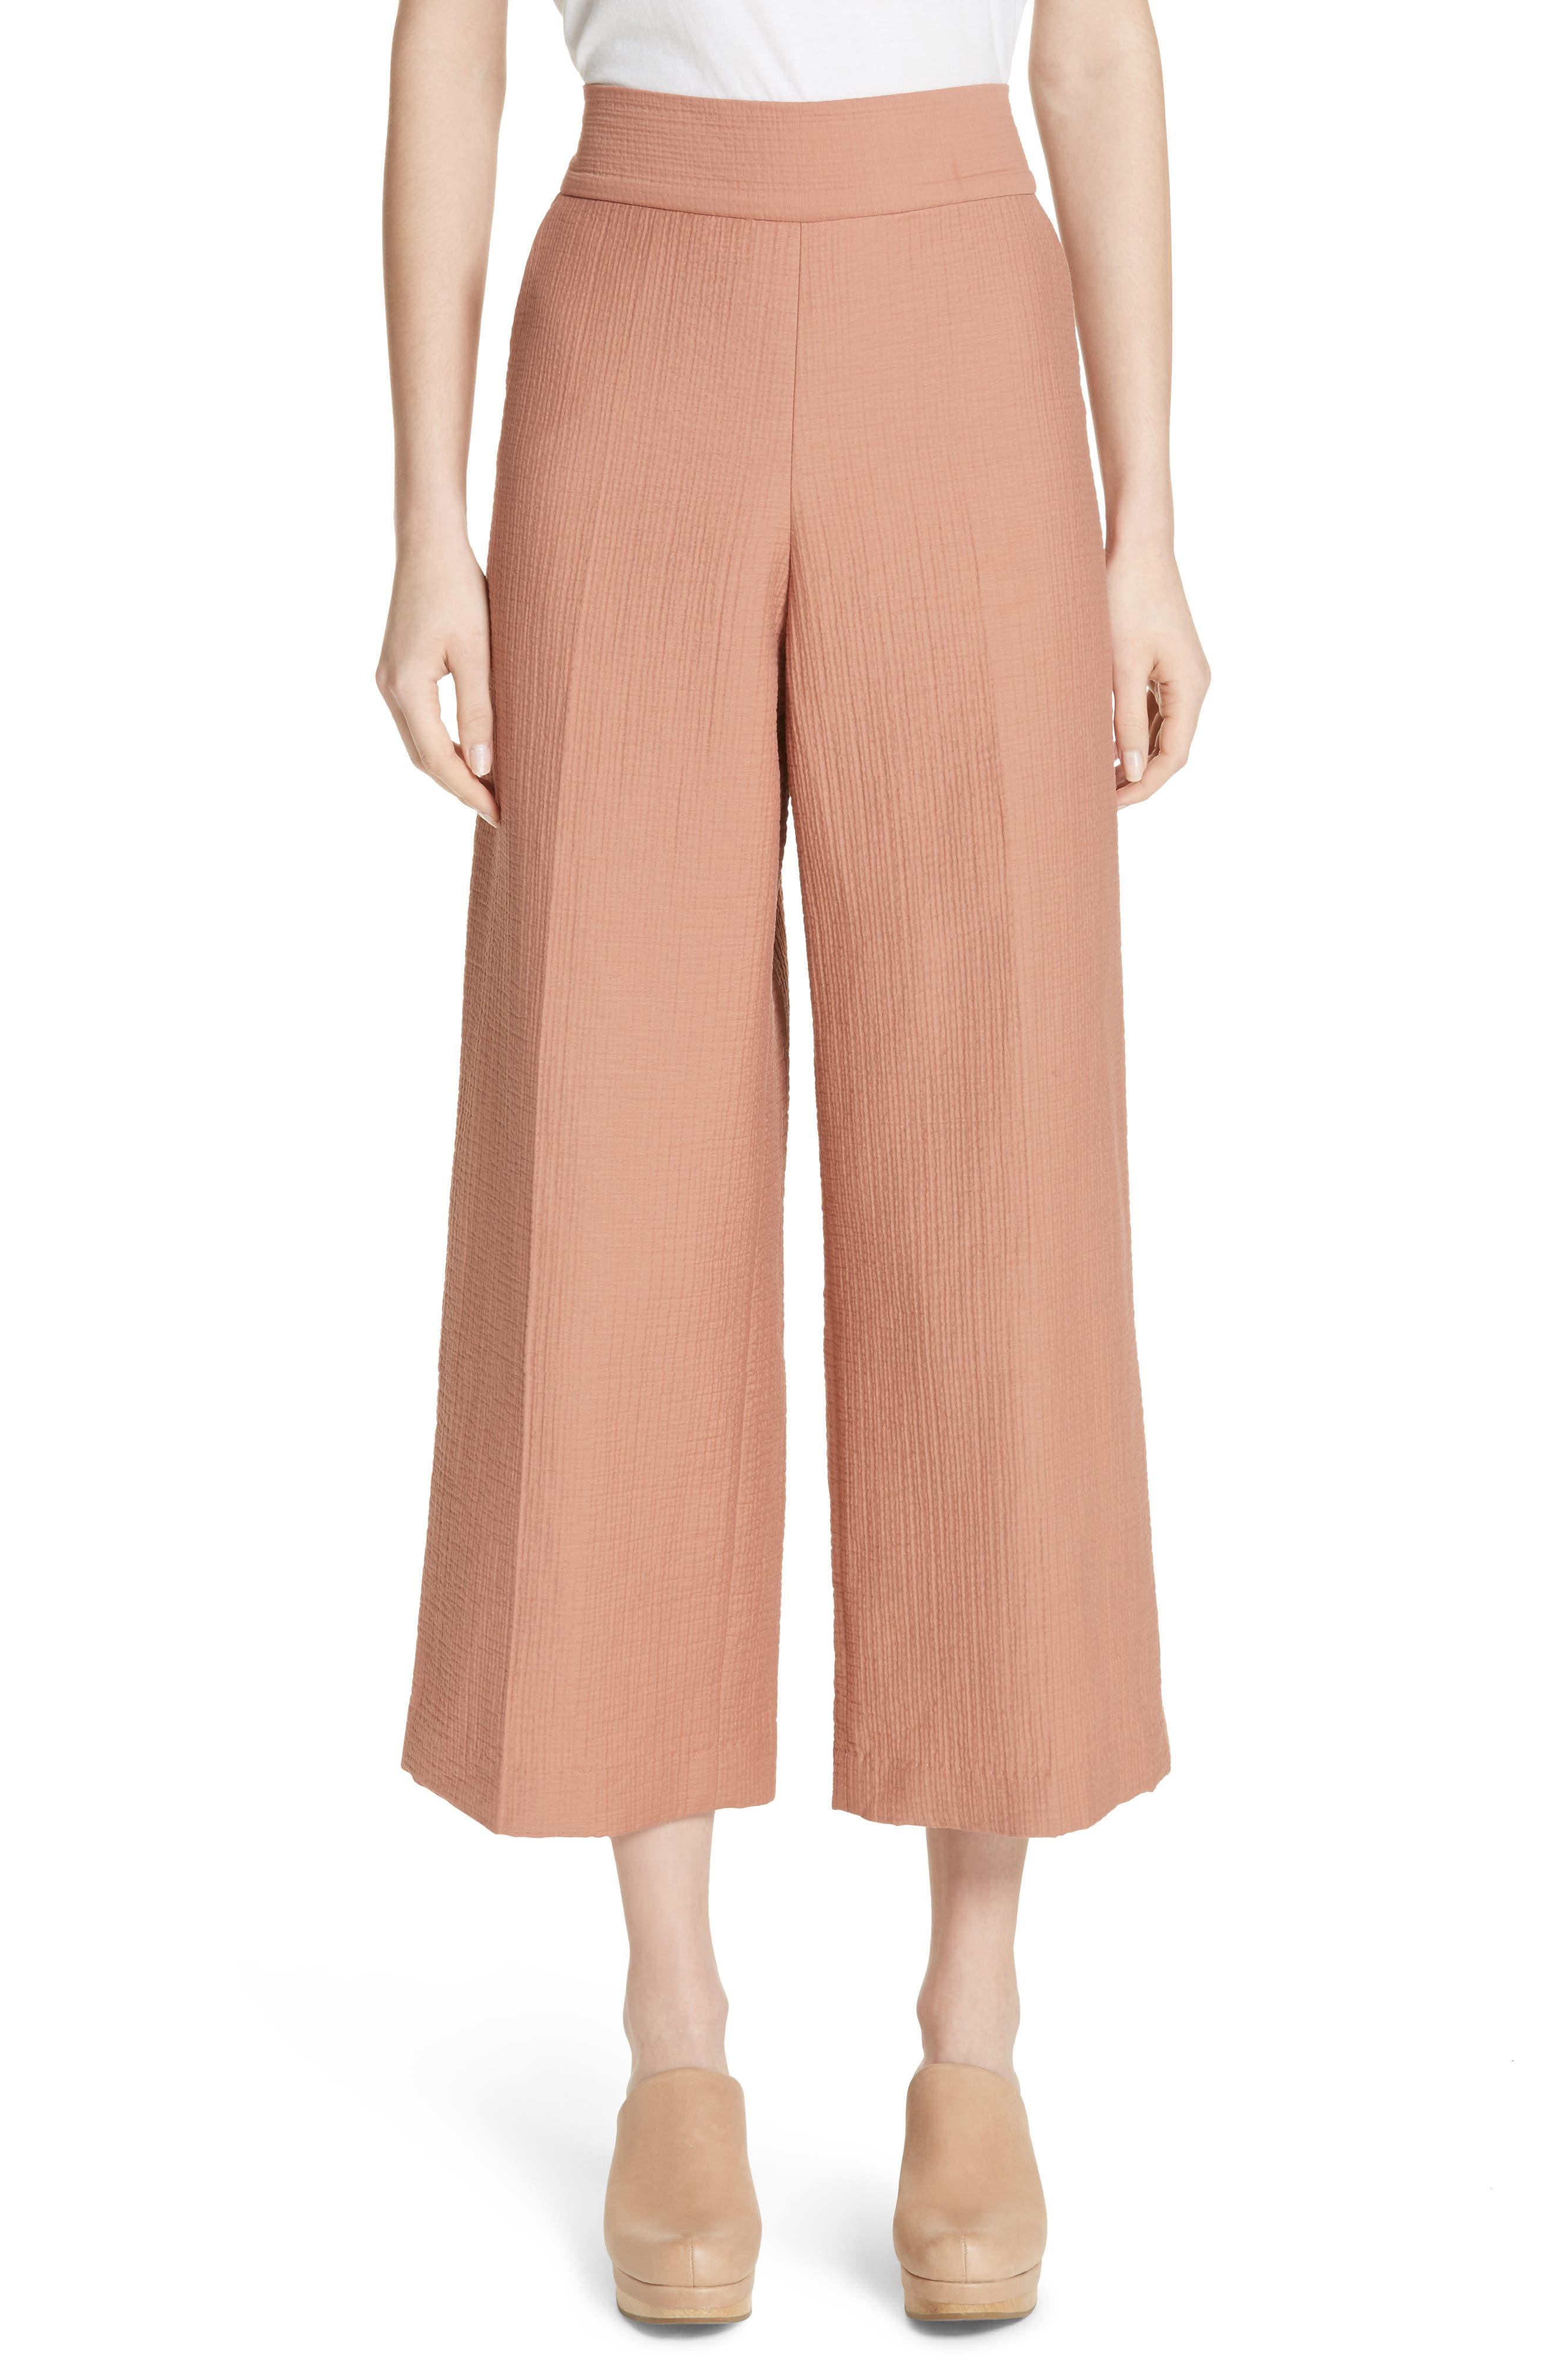 Essence Seersucker Crop Pants,                         Main,                         color, BLUSH